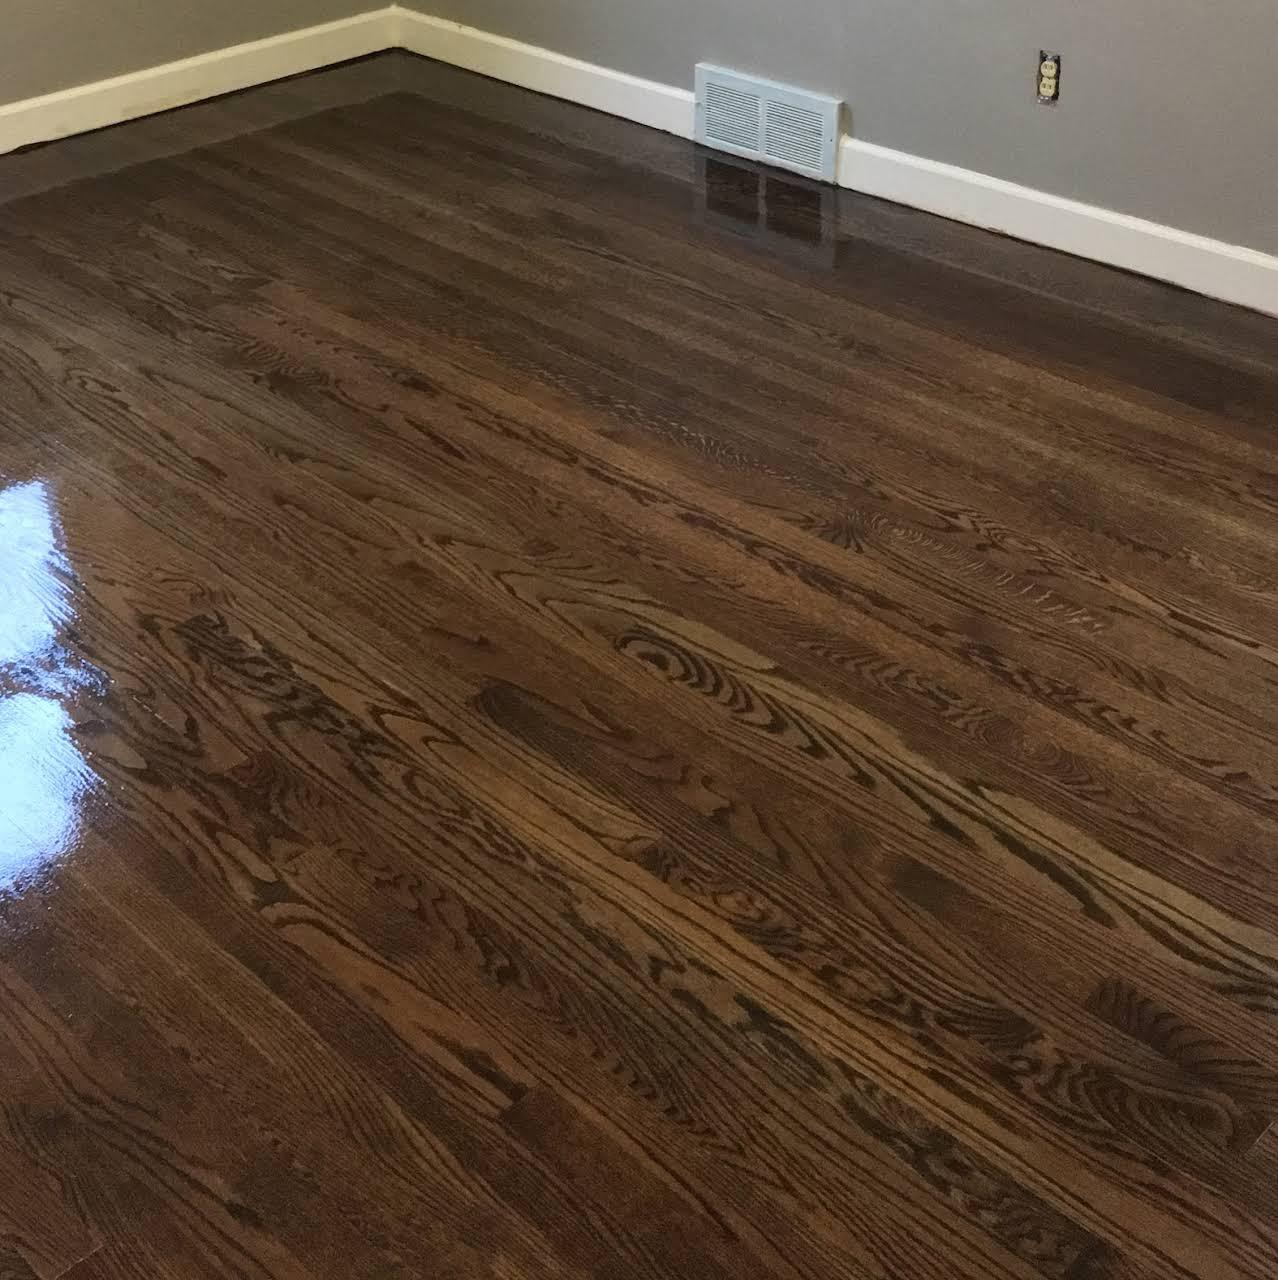 Report Post. New Generation Hardwood Floor Services ...